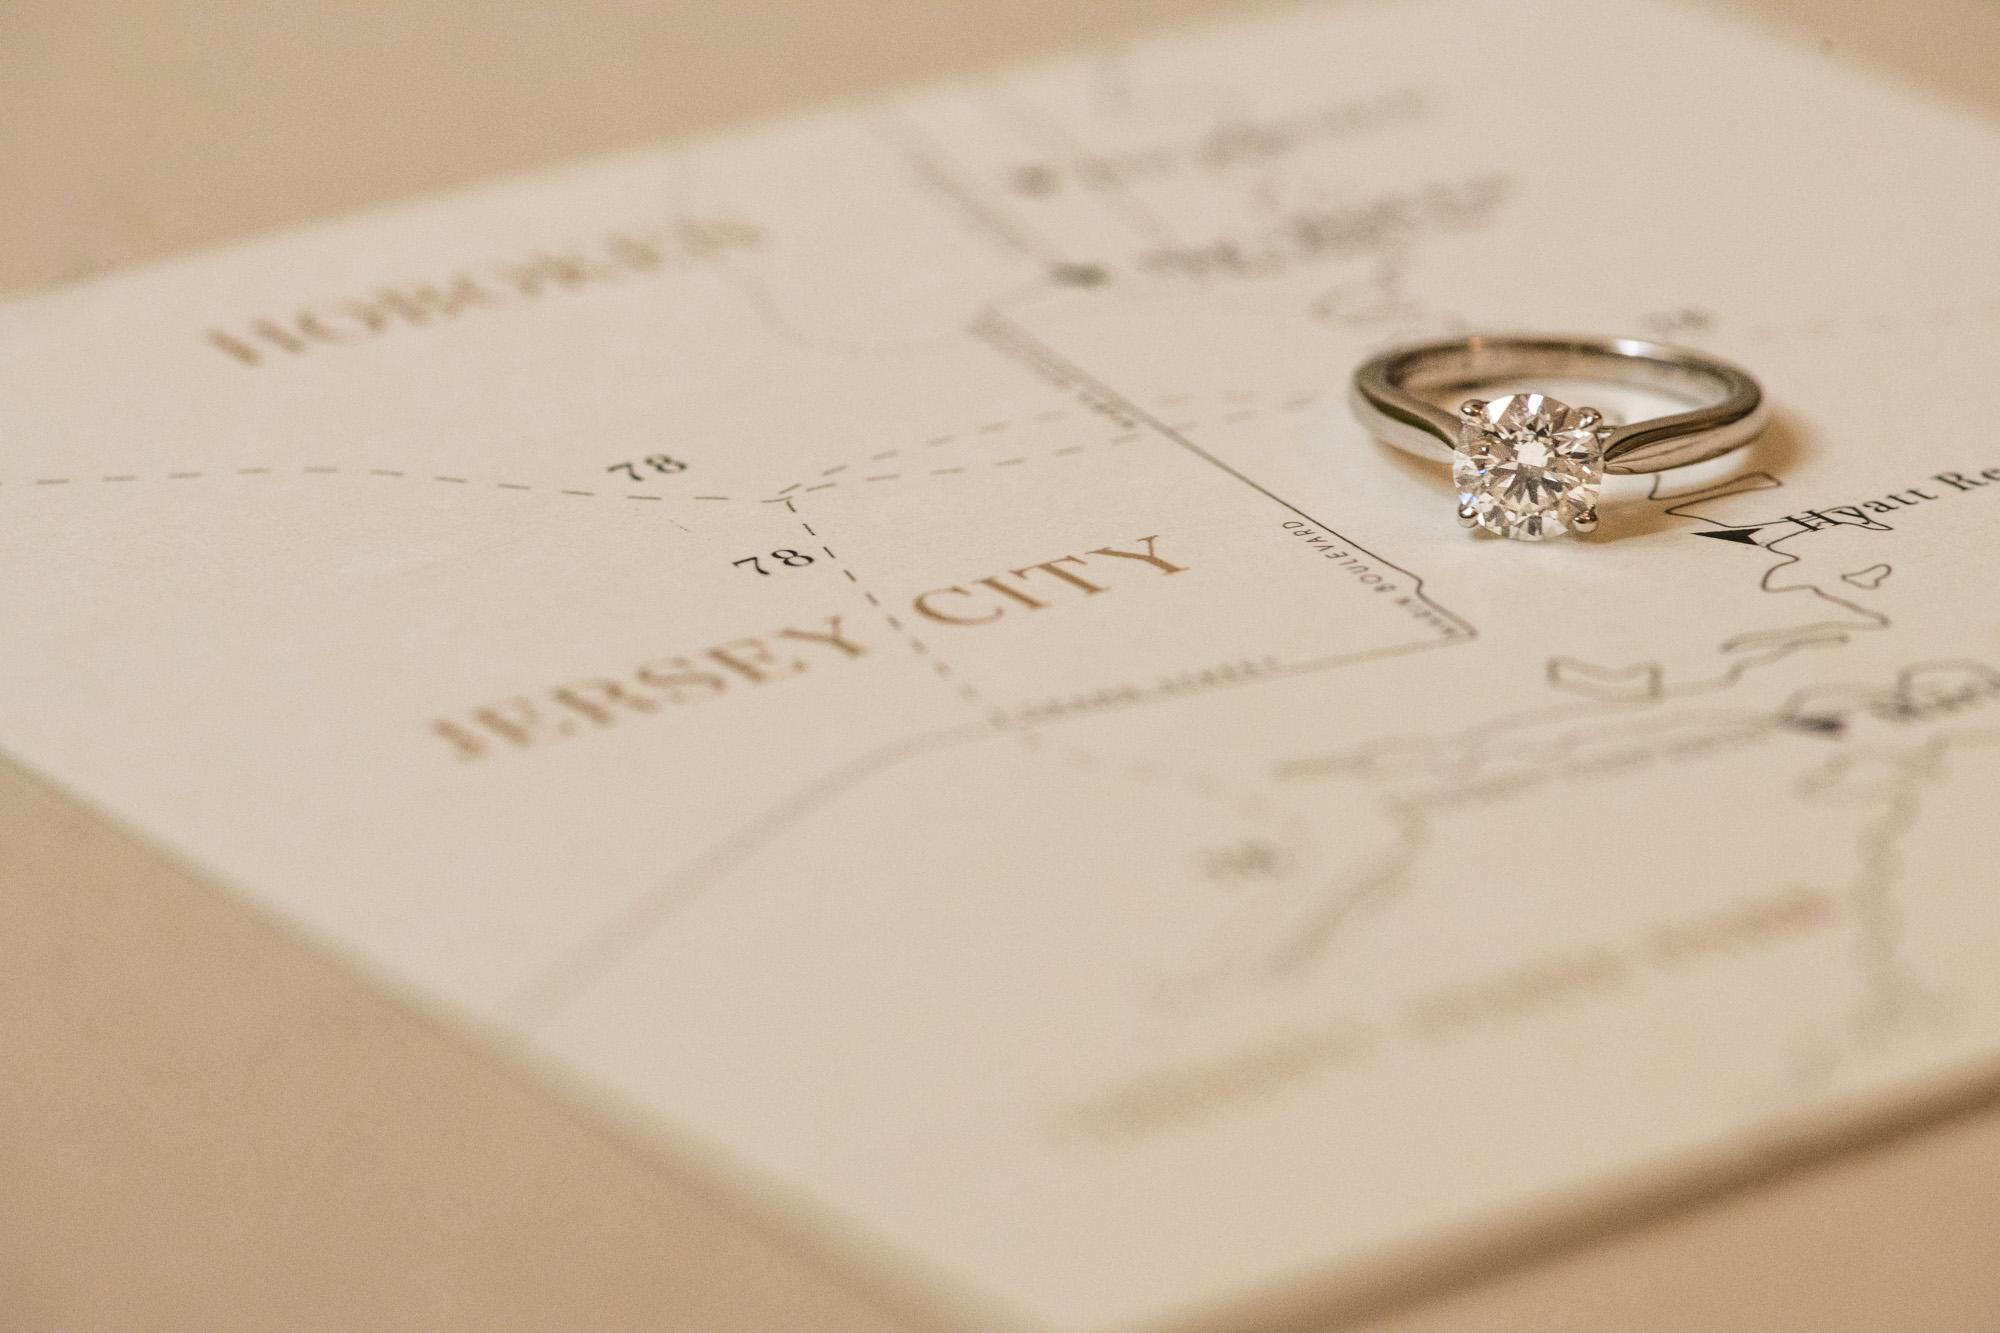 nj-wedding-photographer-maritime-parc-maria-david-2.jpg